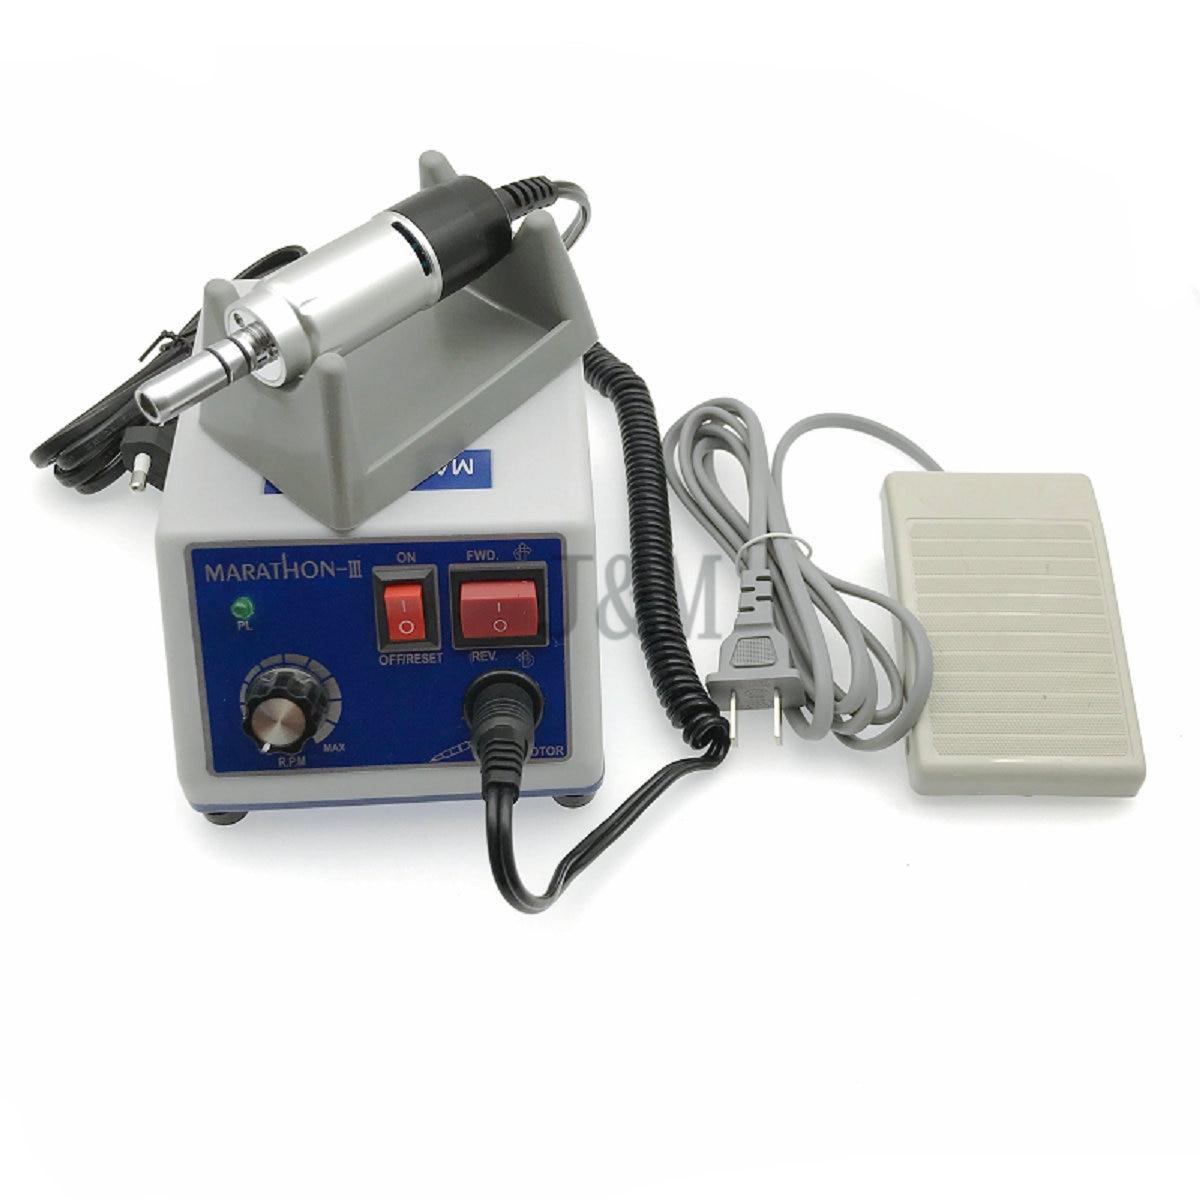 Dental Lab MARATHON Micromotor Machine N3 + Electric Micro Motor